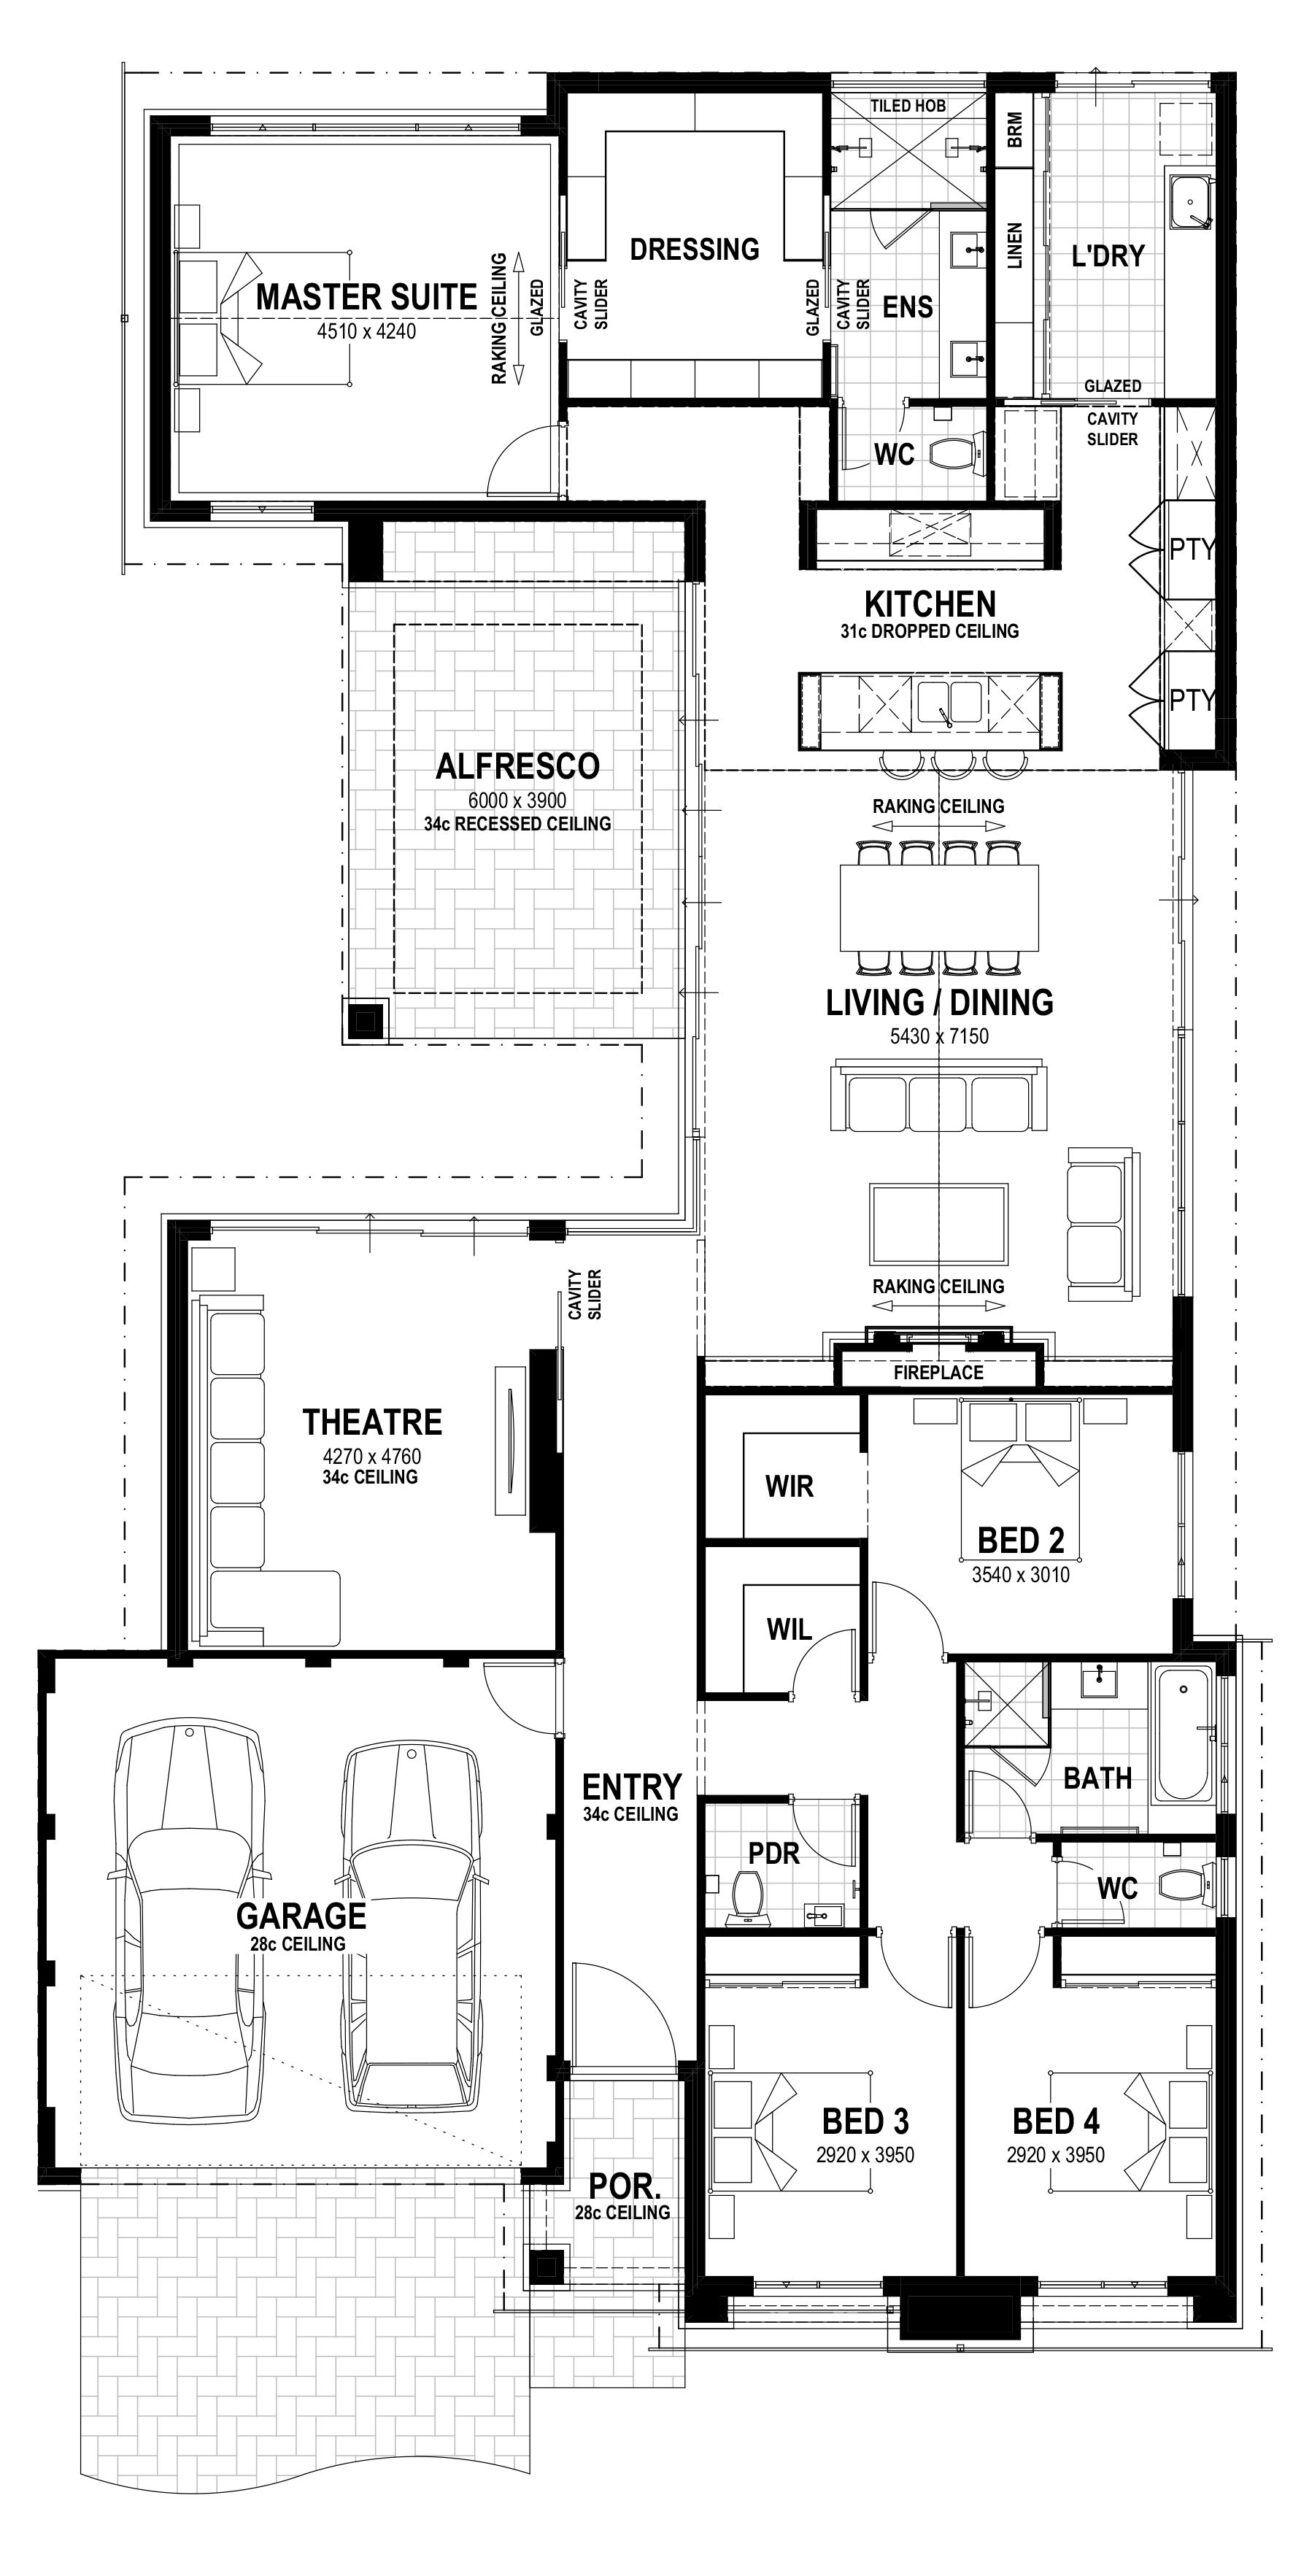 Building Plans For A House Home Design Floor Plans Floor Plan Design Dream House Plans